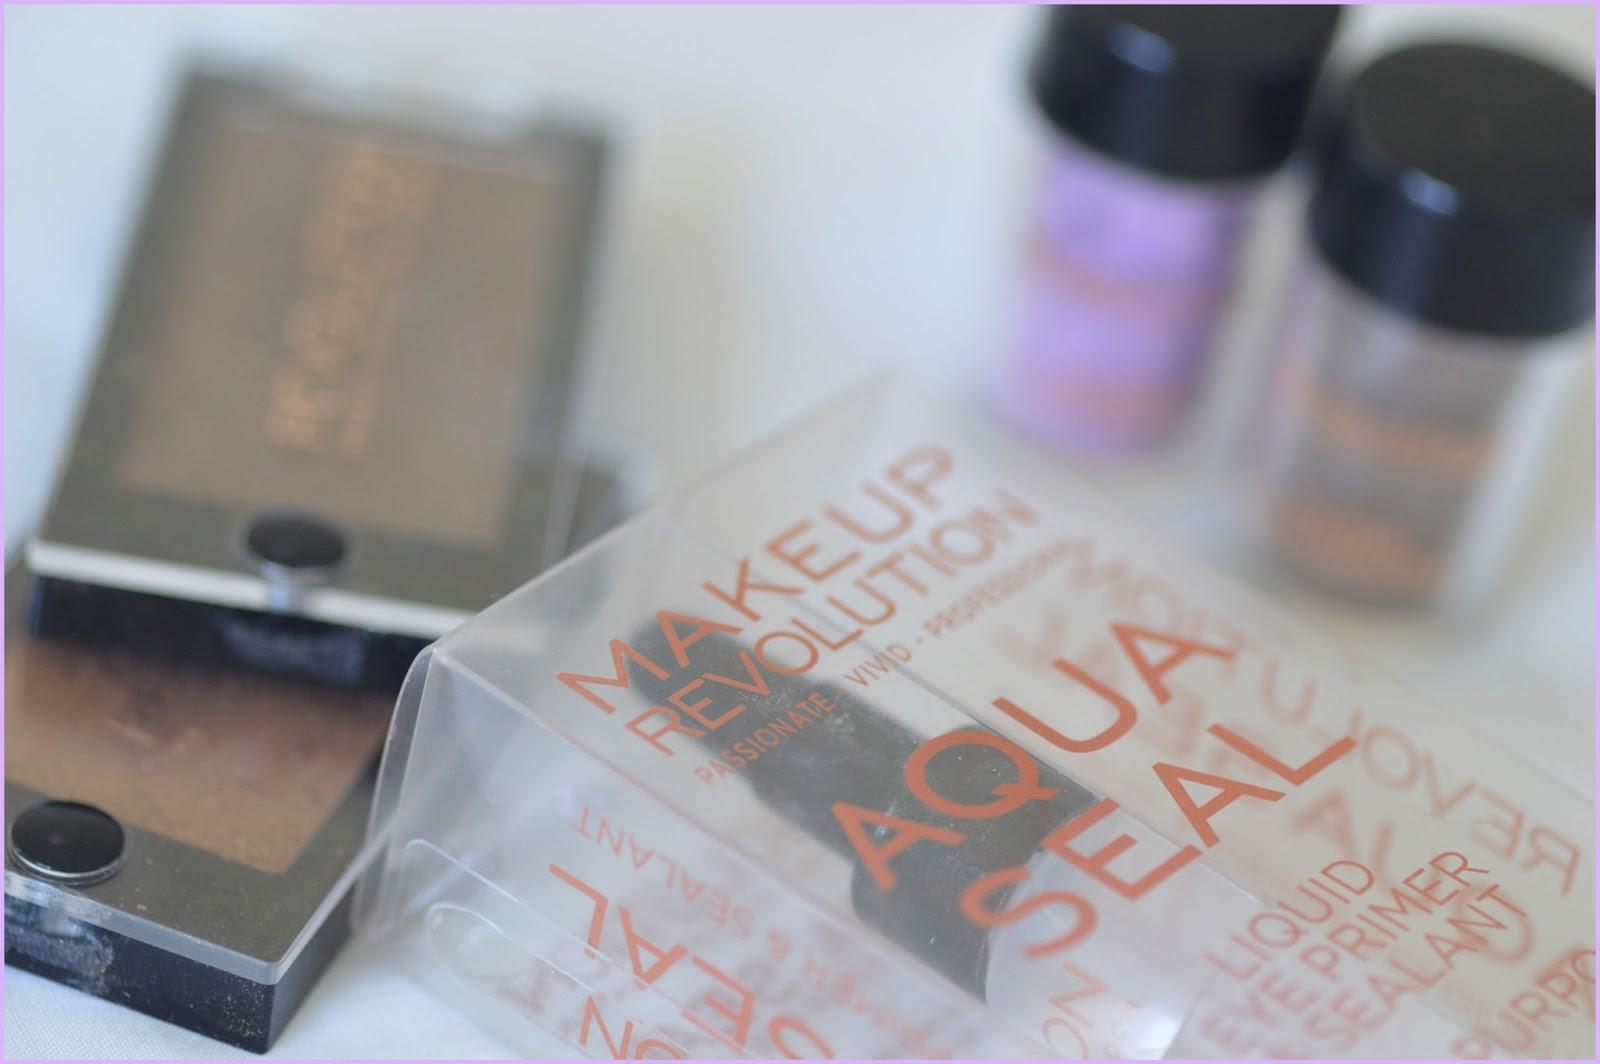 Aqua Seal Liquid Eye Primer by Revolution Beauty #7